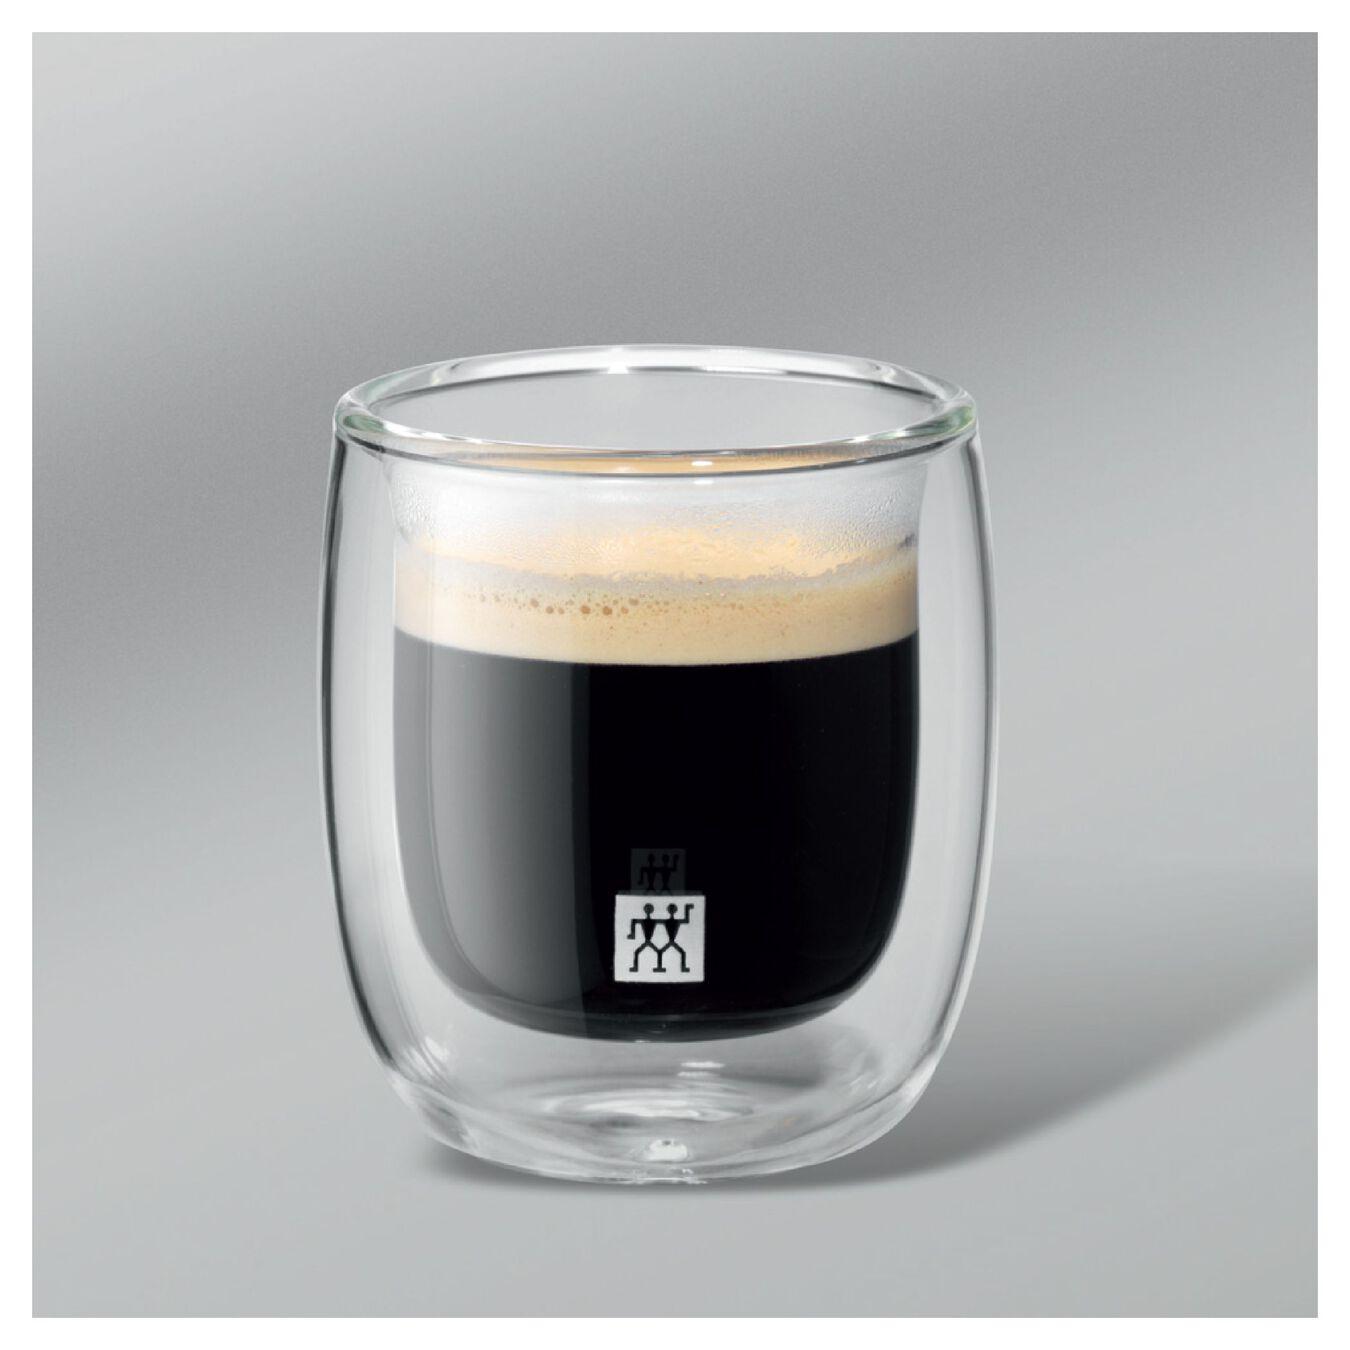 Çift Camlı Espresso bardağı seti, 2-parça,,large 4